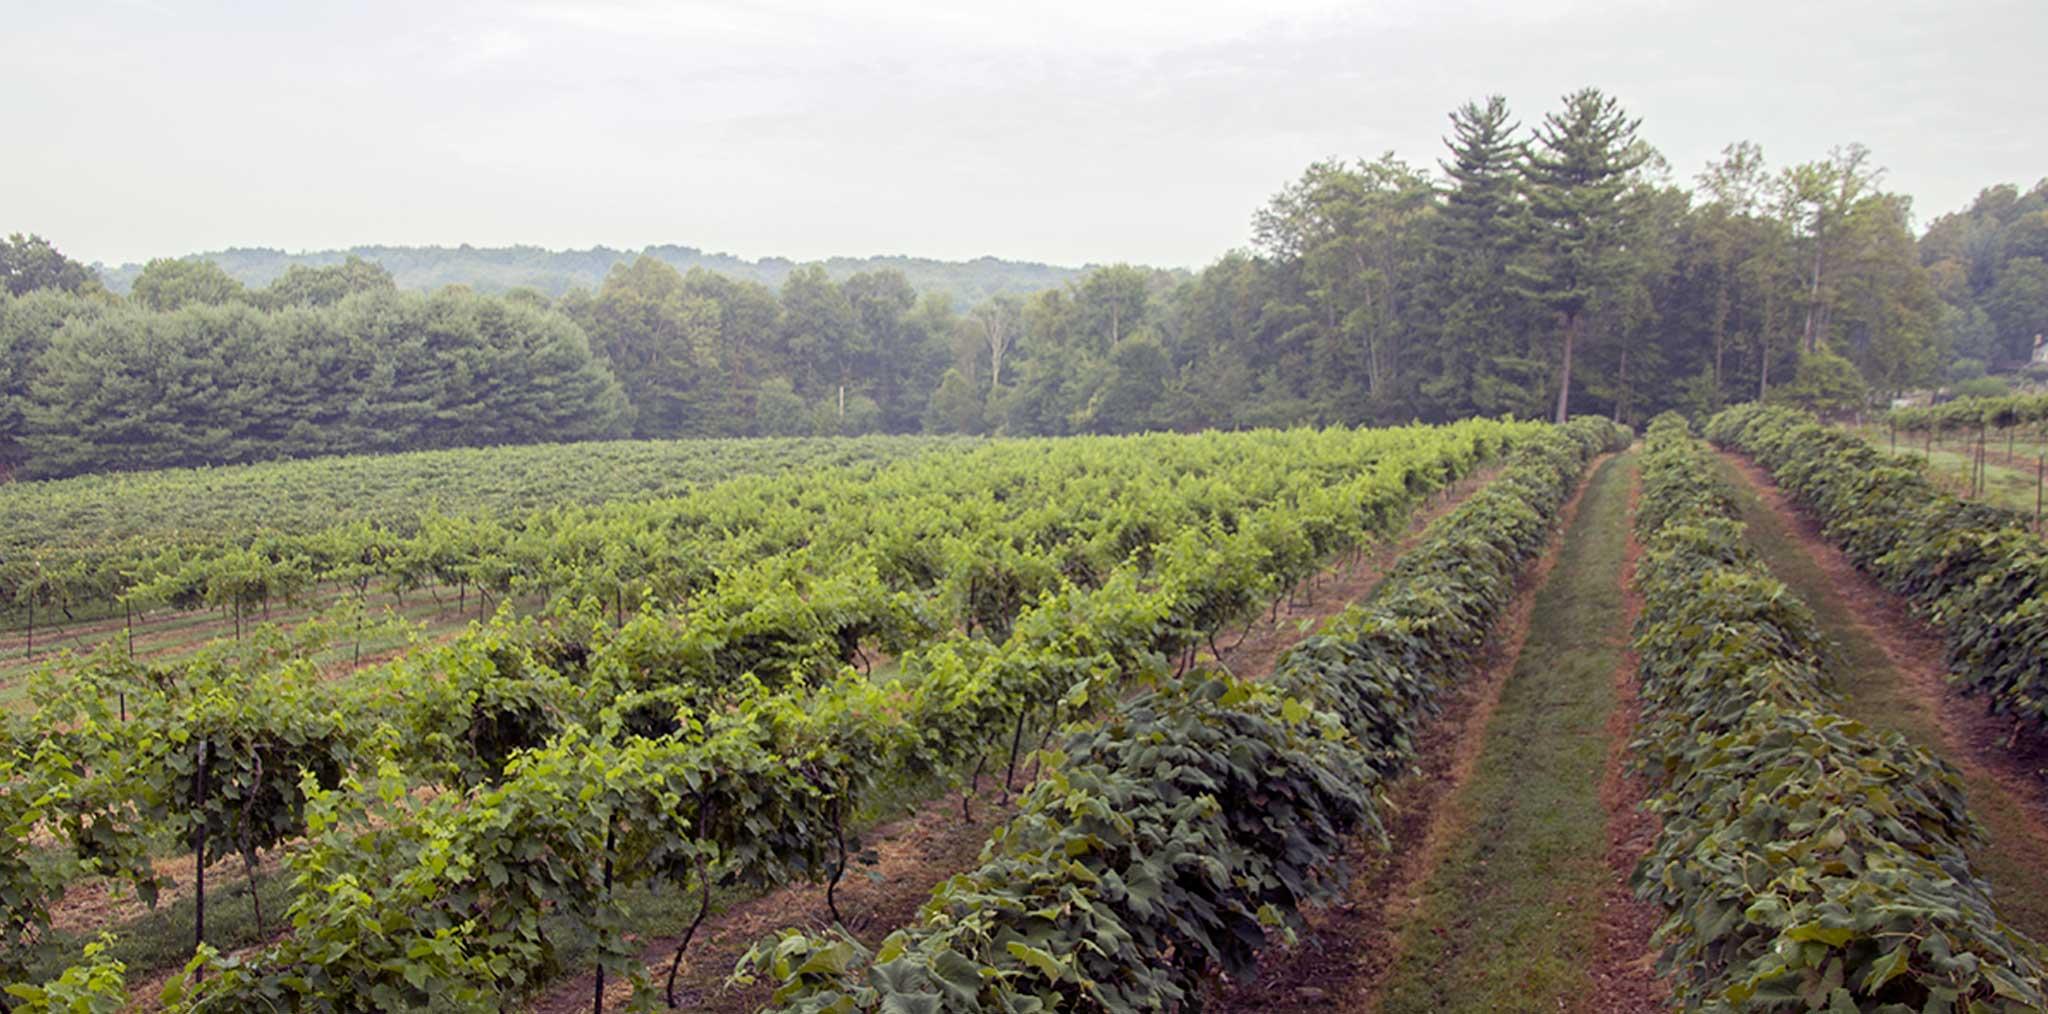 French Ridge Vineyards — Discover Plenty of Wine